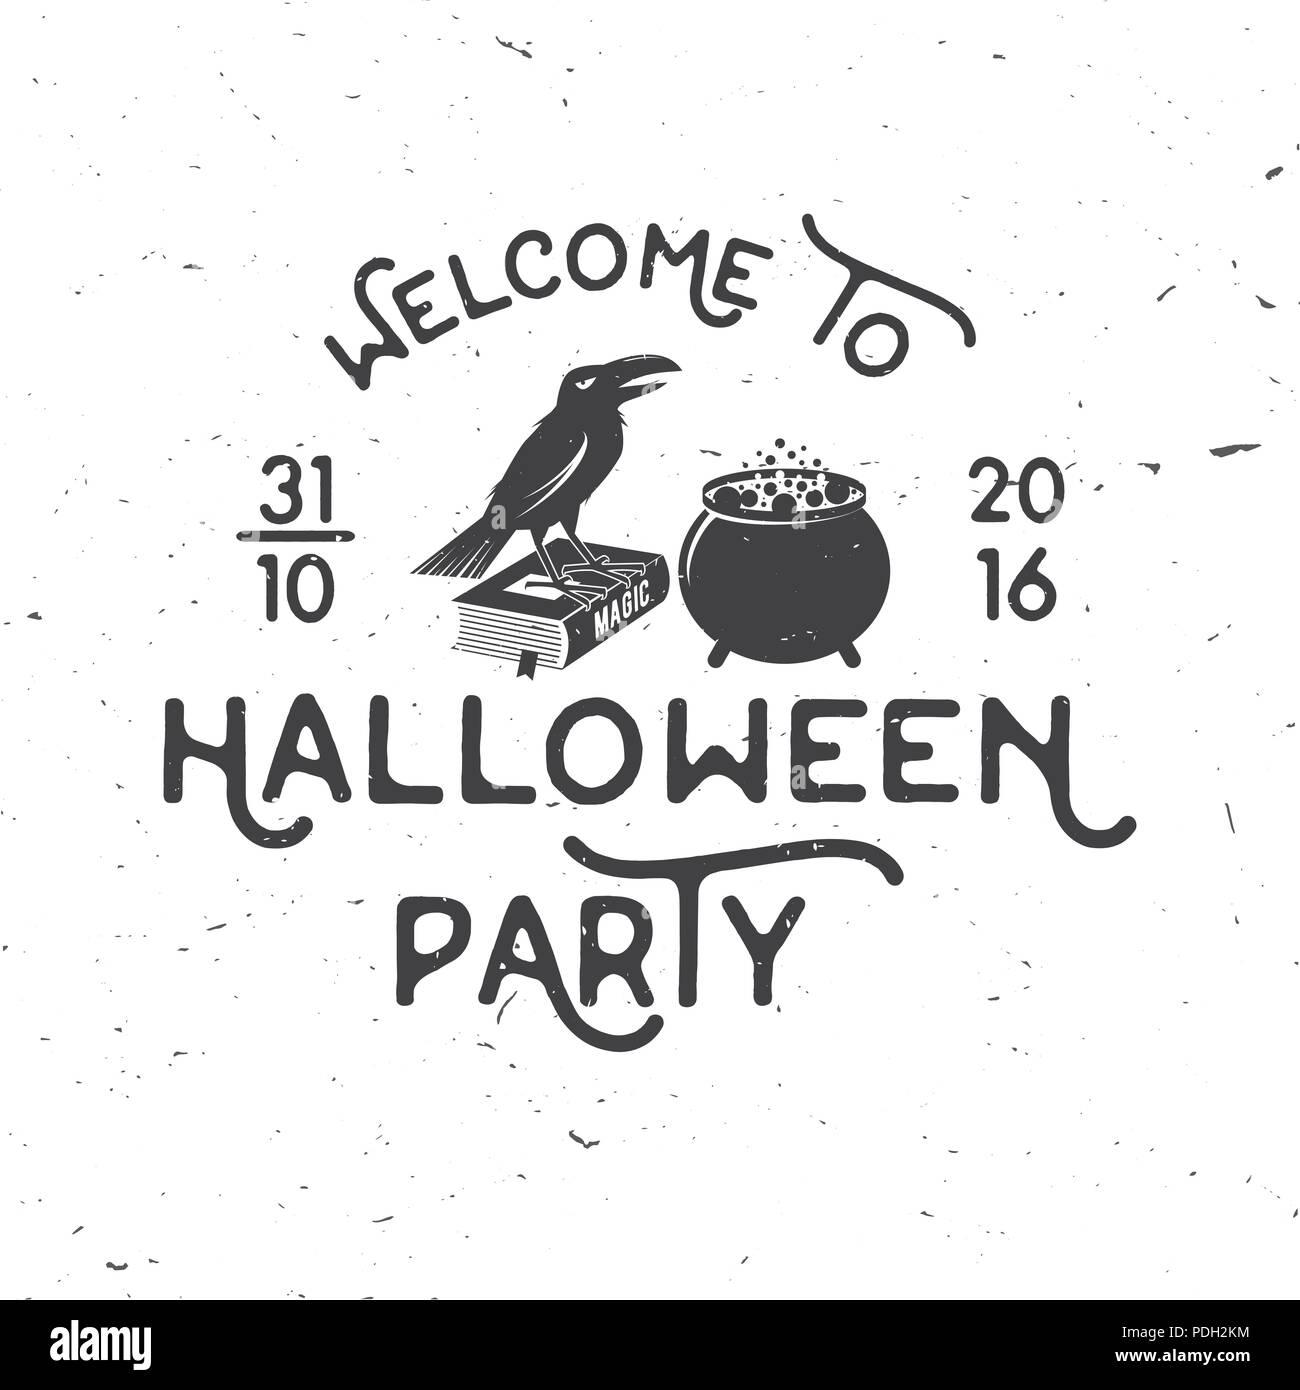 Welcome to Halloween party  Vector Halloween retro badge  Concept